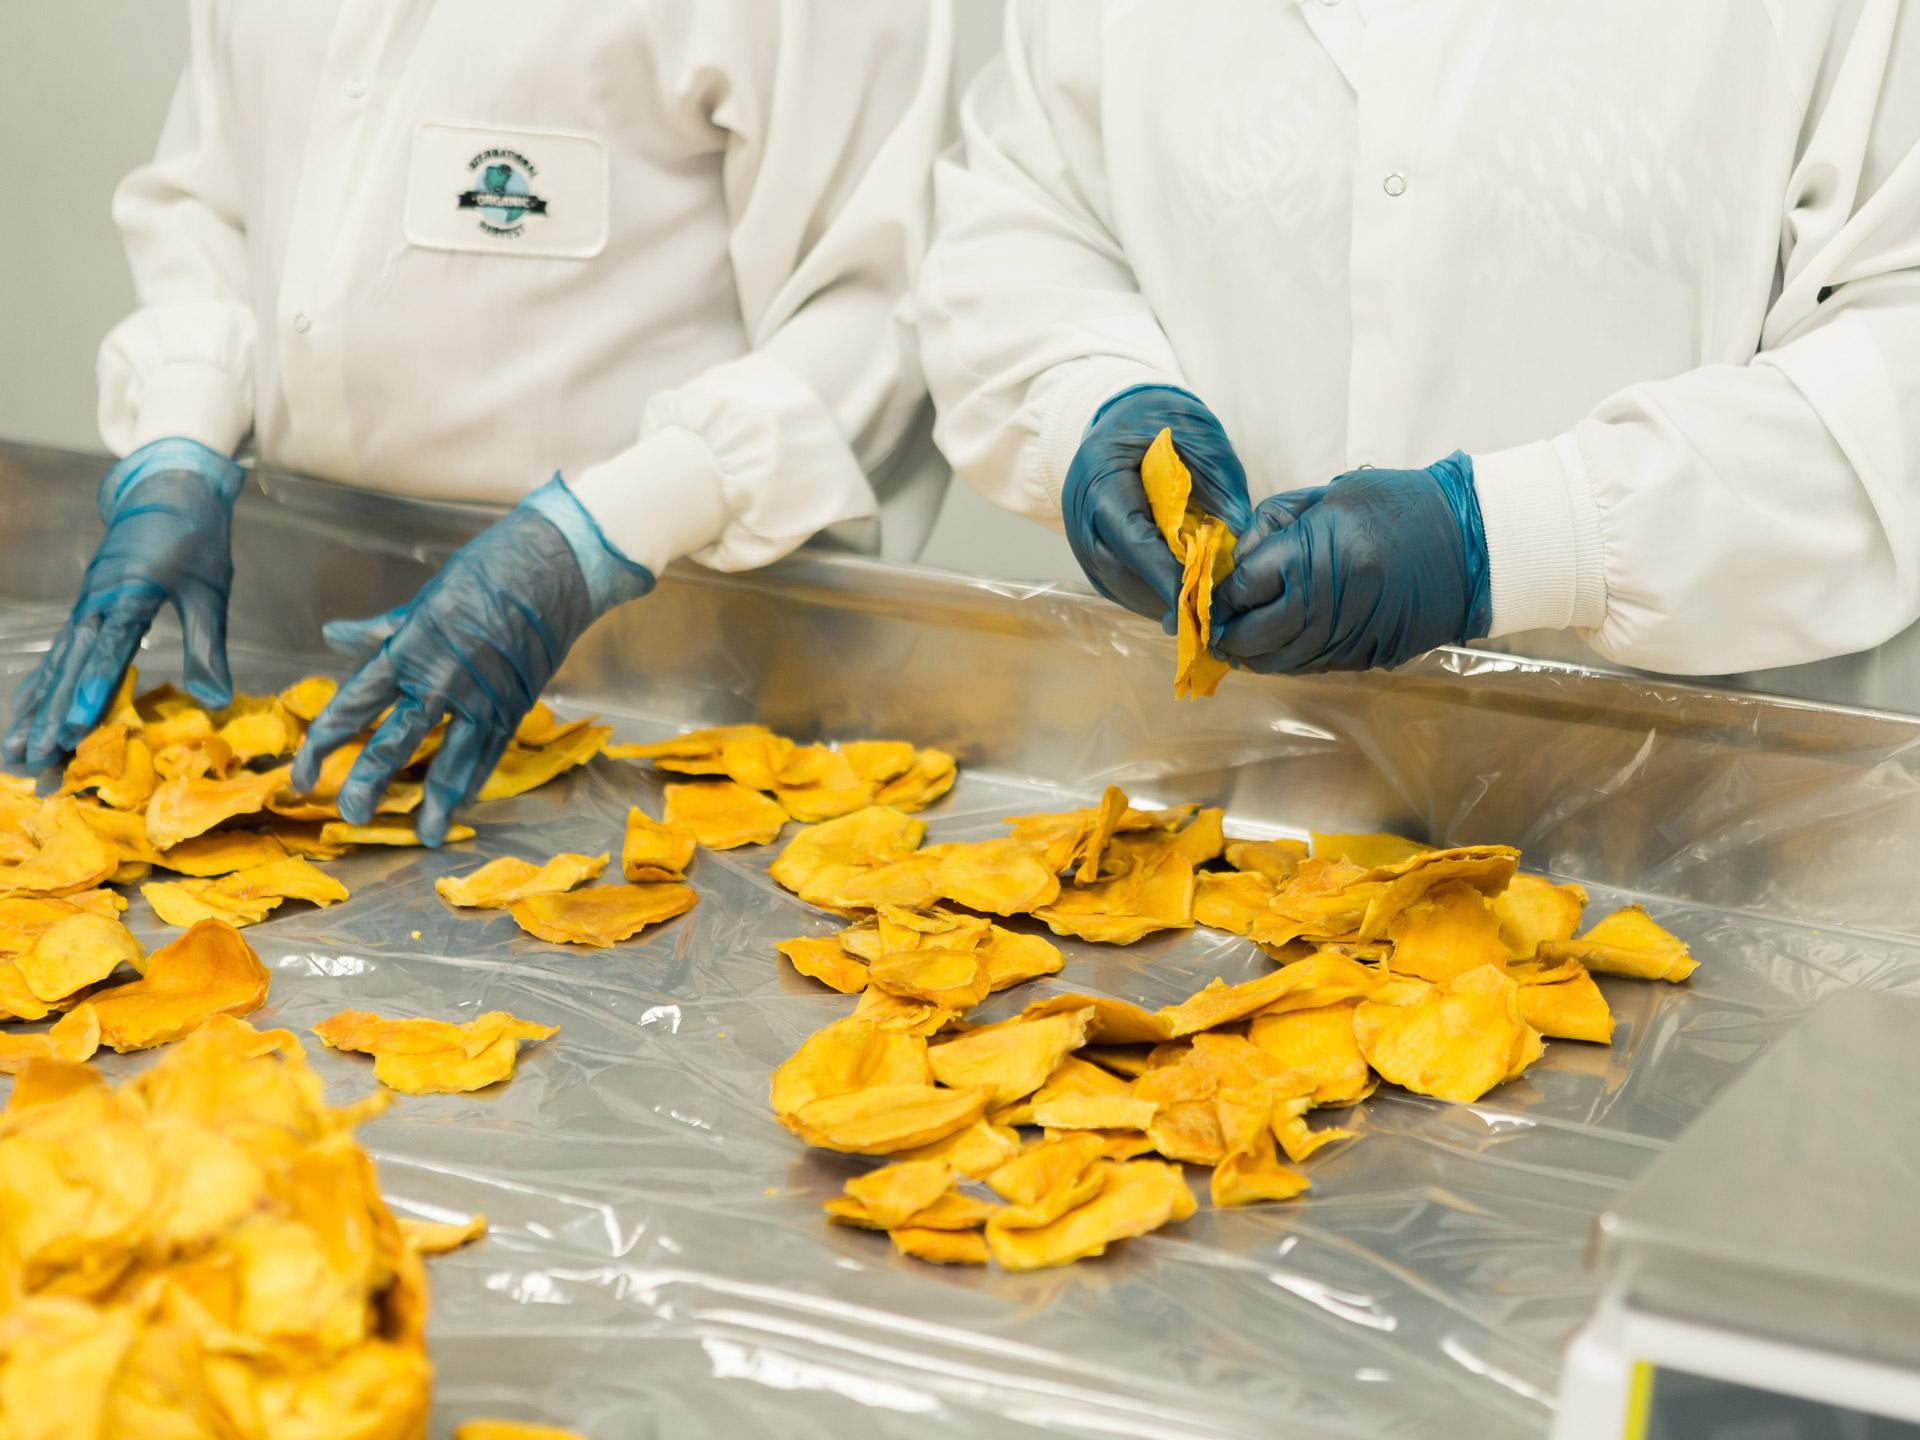 Labor, Lebensmittel